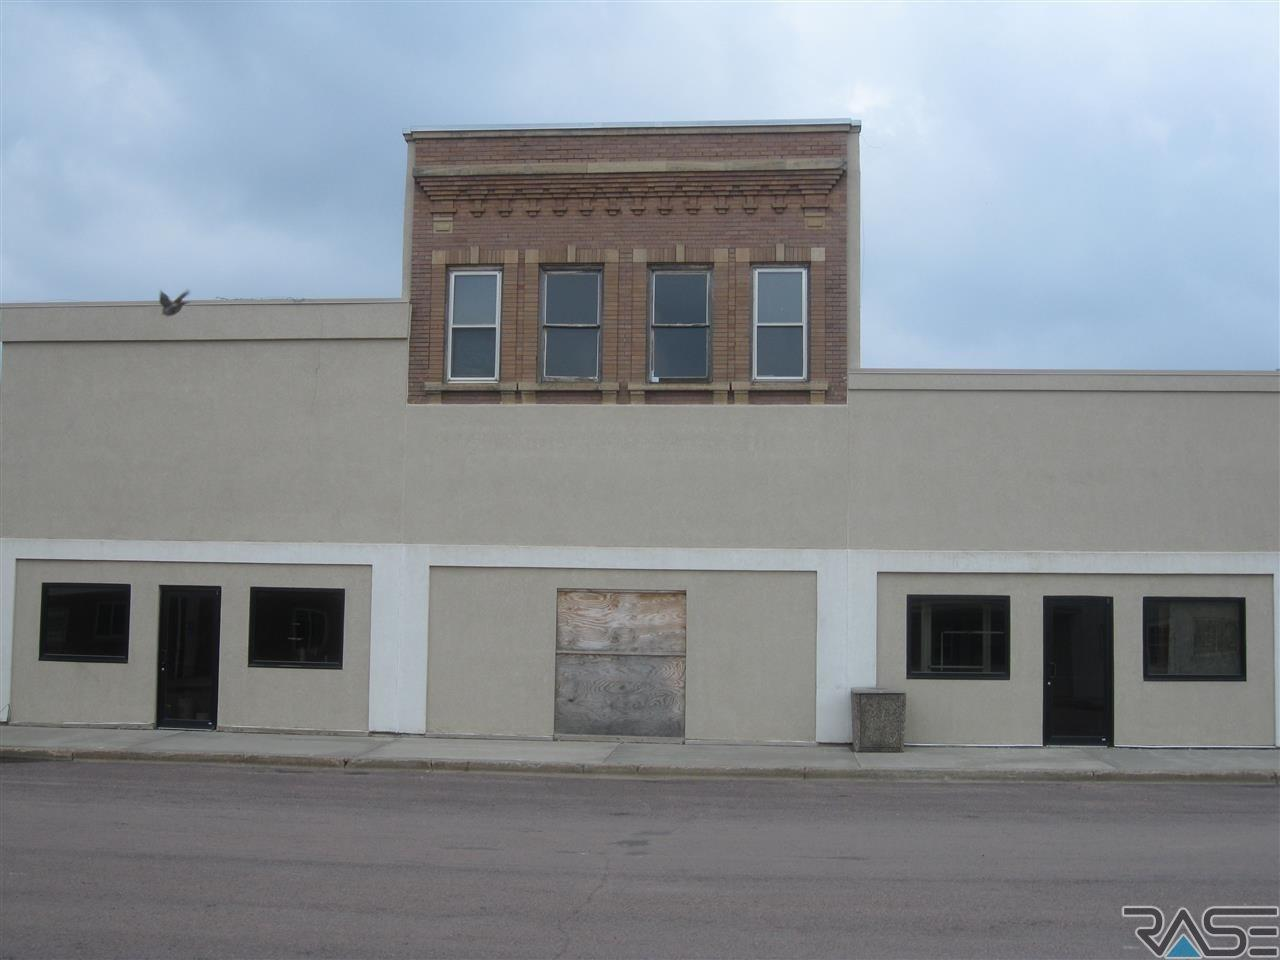 Sale Pending on 251 N Main, Salem South Dakota